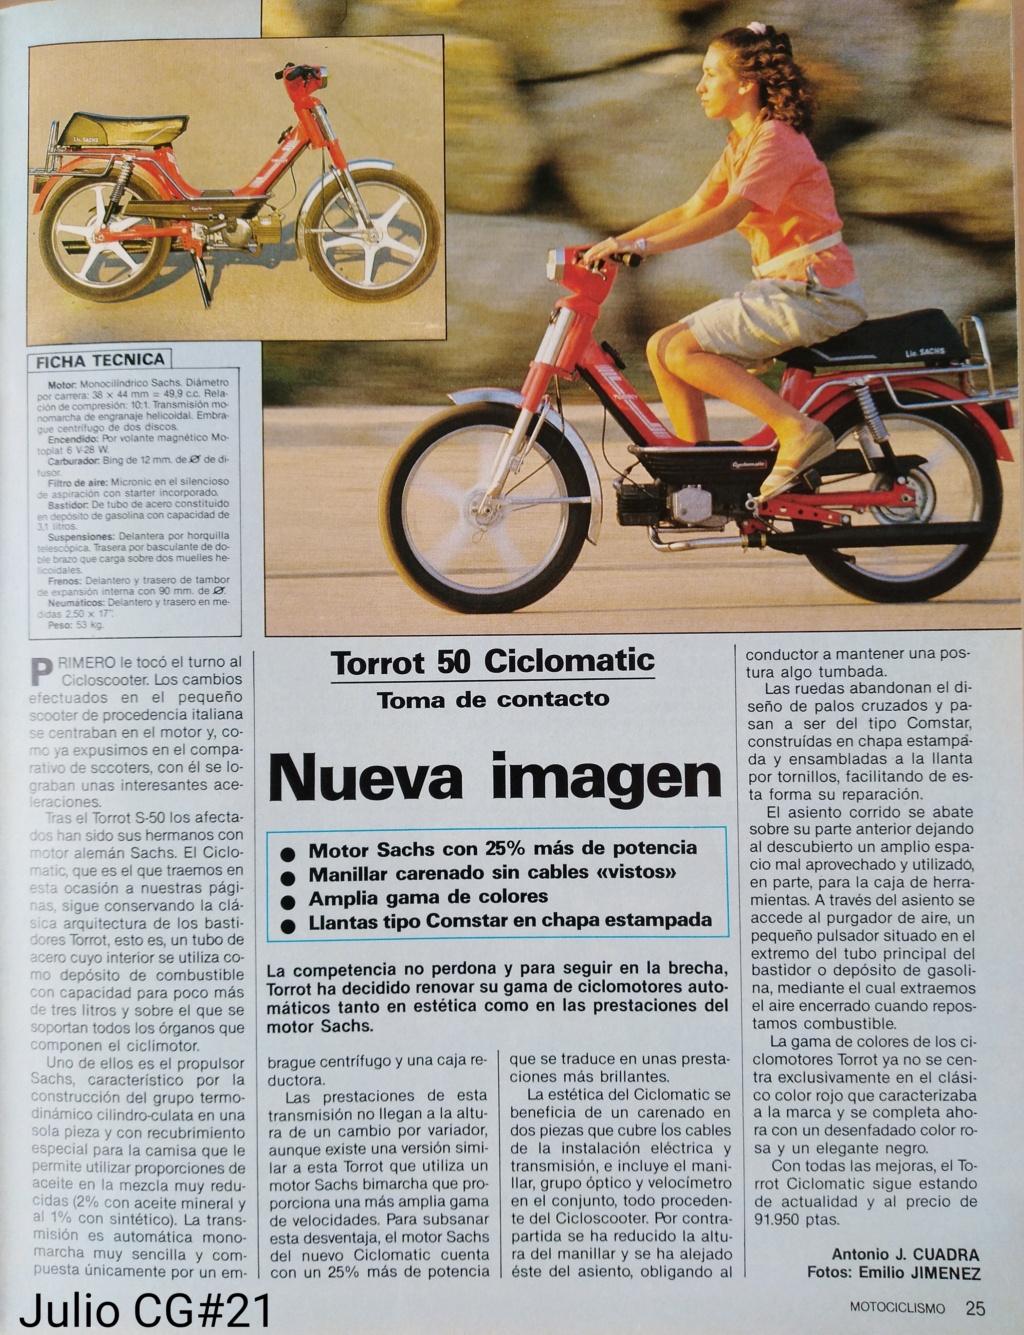 Torrot - Ciclomotor Torrot Ciclomatic Img_2104